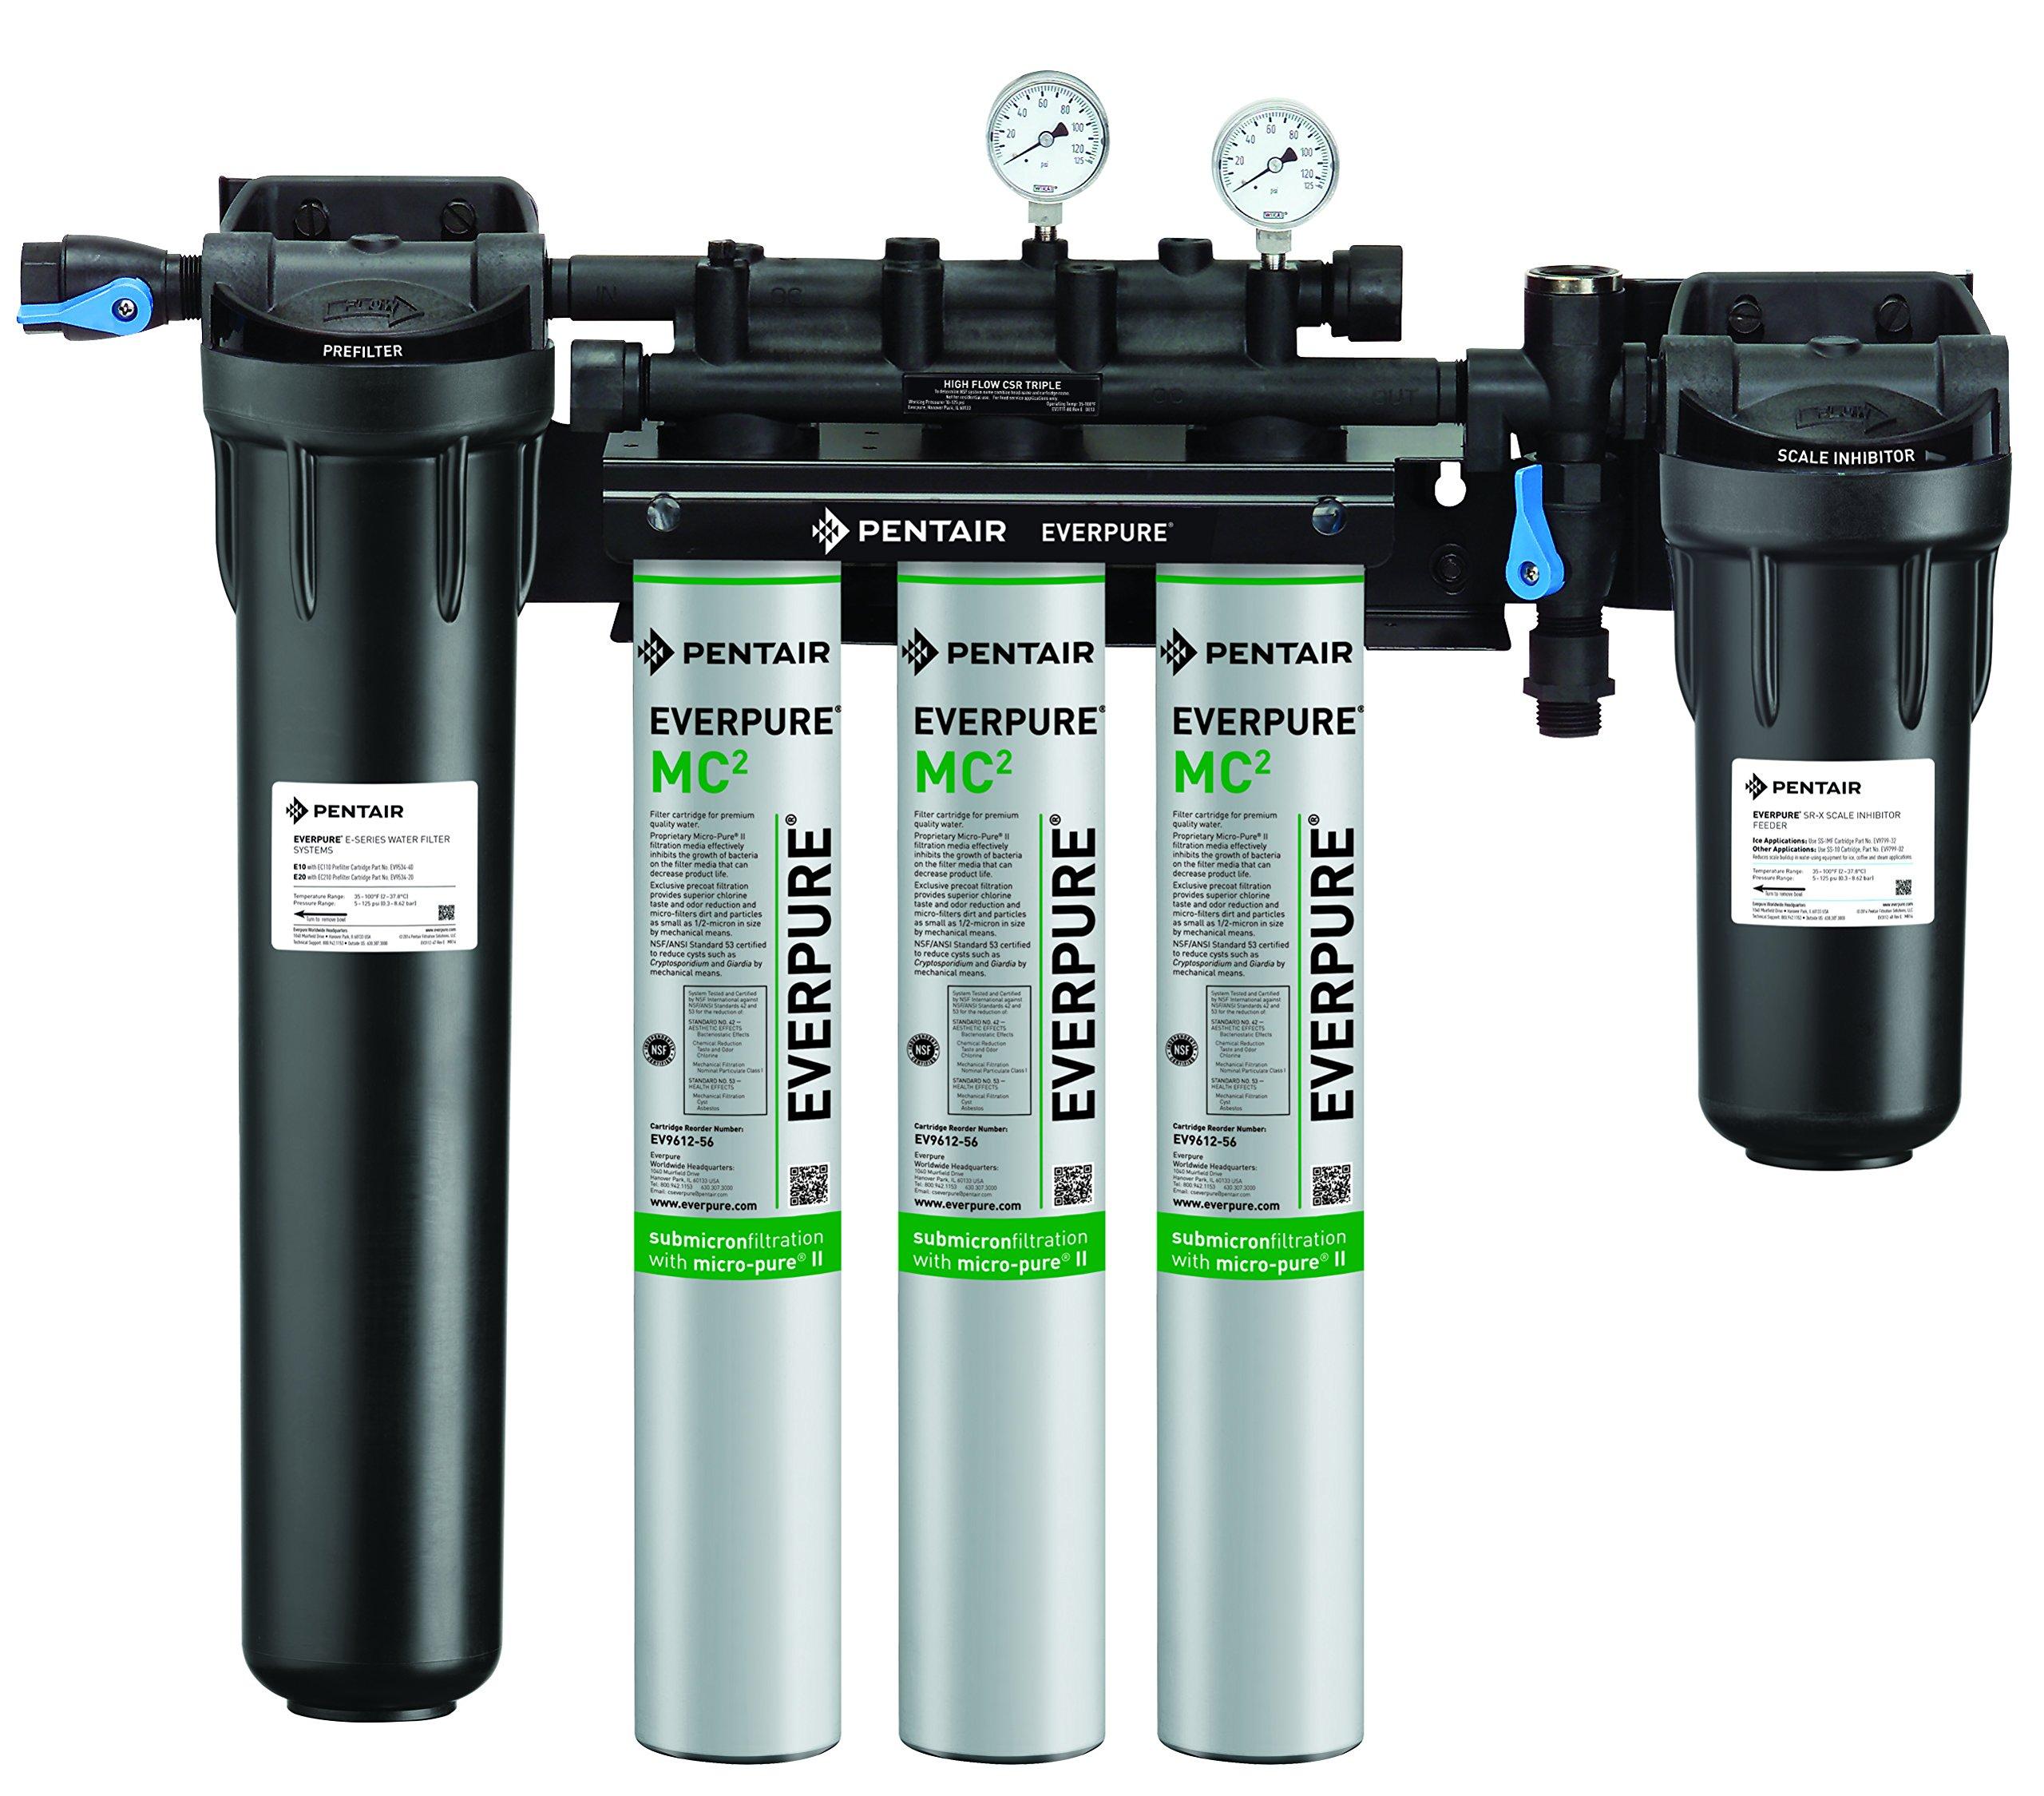 Everpure Water Filter Cartridge MC-2 EV9612-56